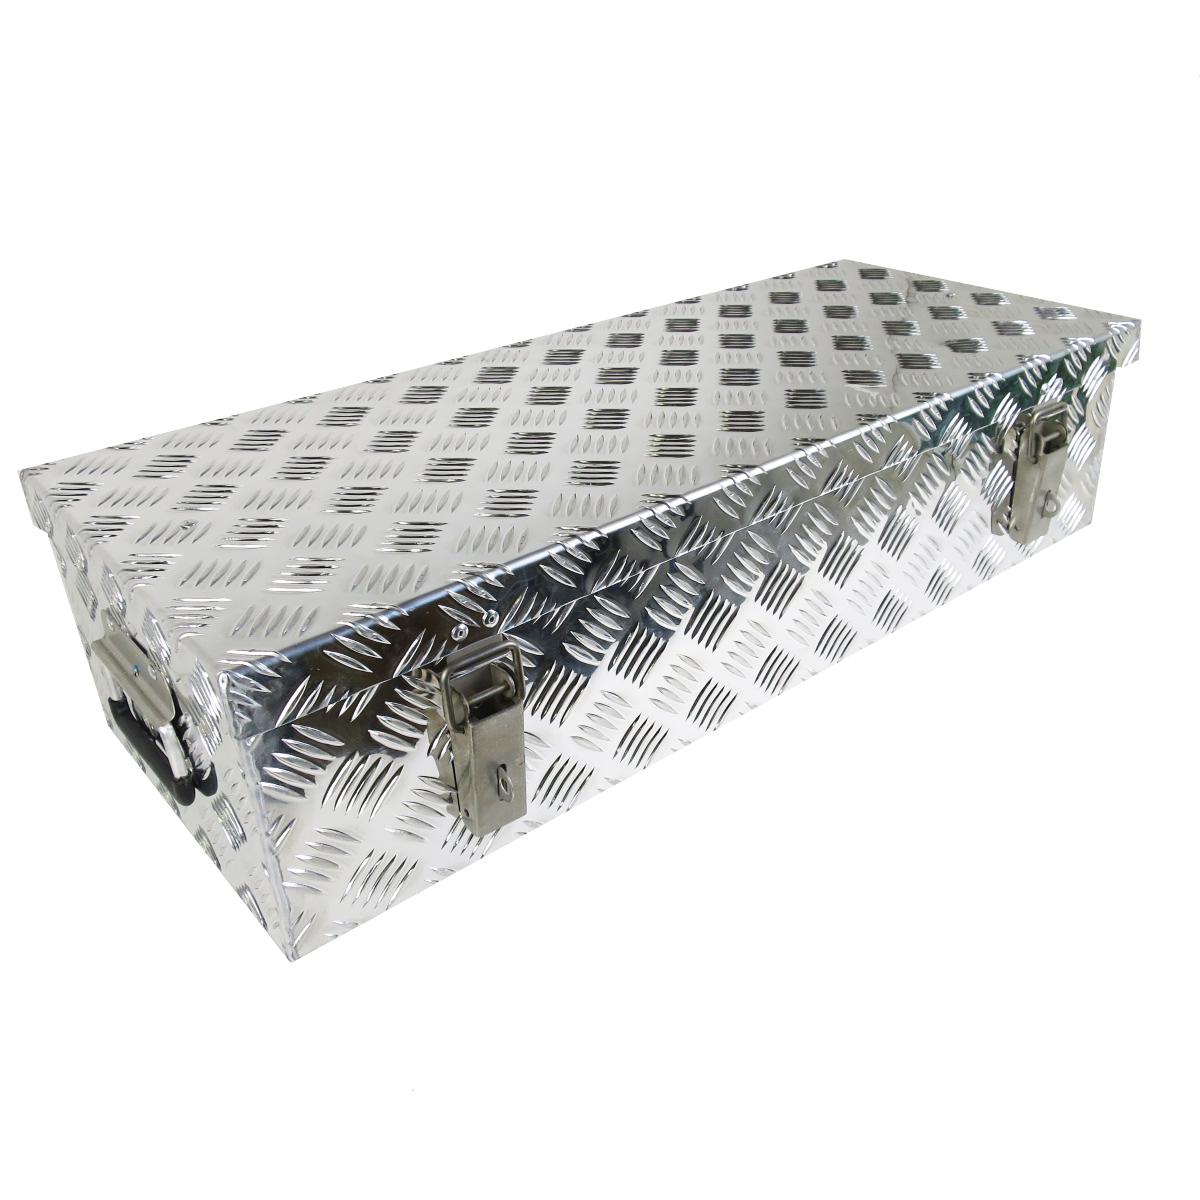 deichselbox staubox aus aluminium 820 x 320 x 200mm f r. Black Bedroom Furniture Sets. Home Design Ideas